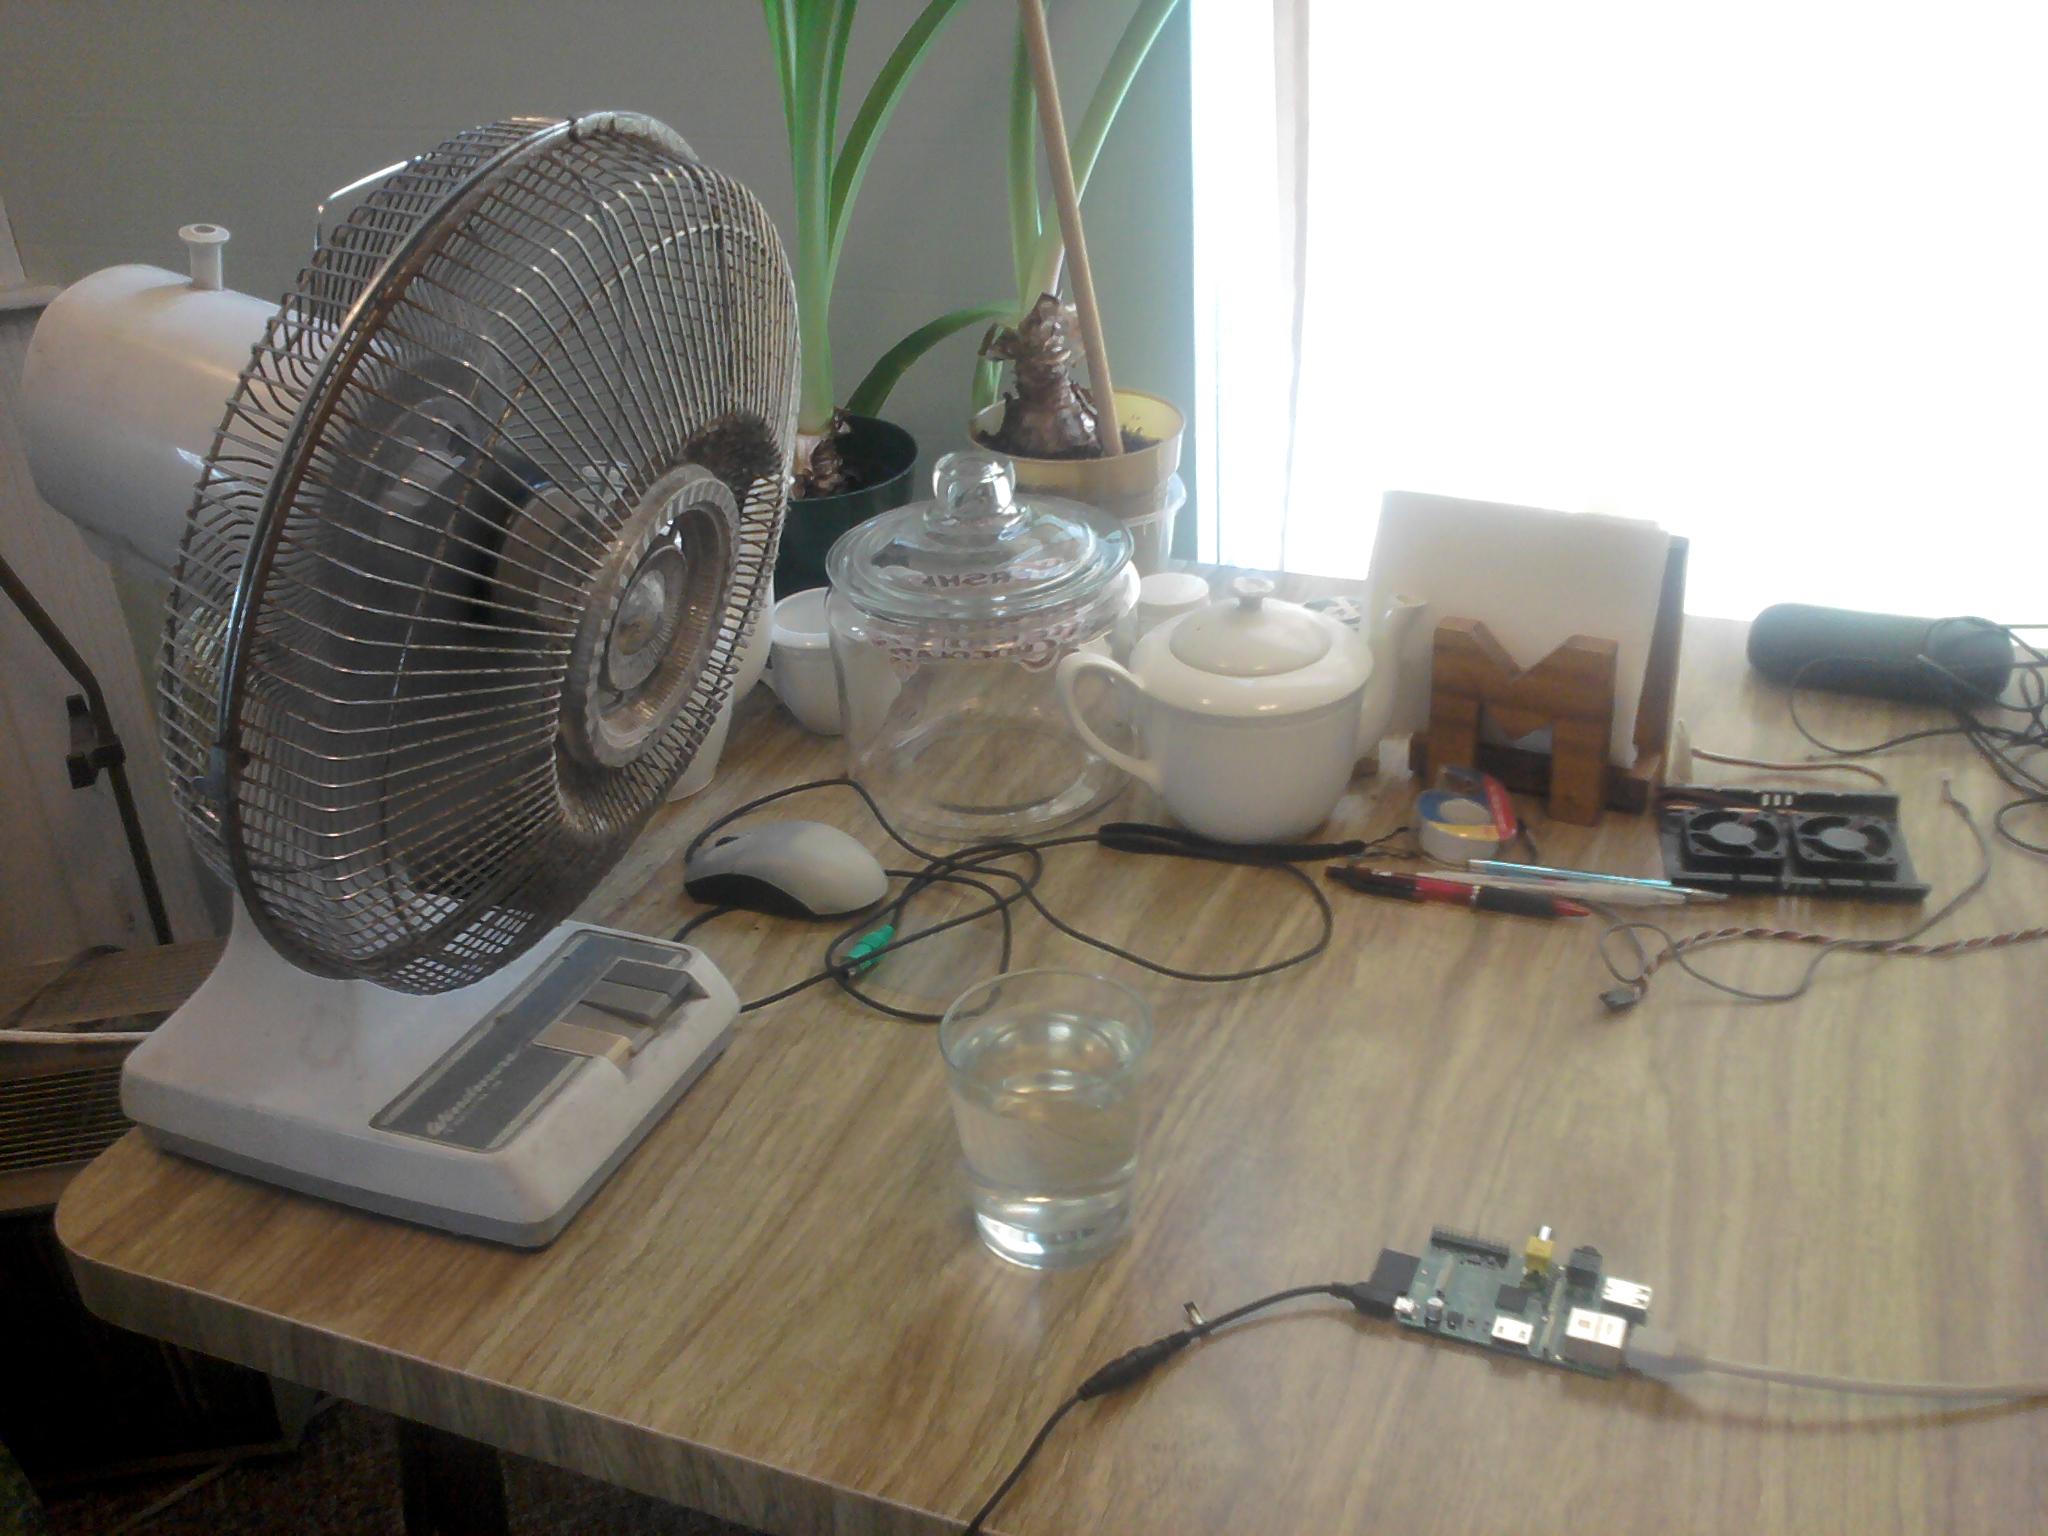 [Obrázek: water-cooled.jpg]